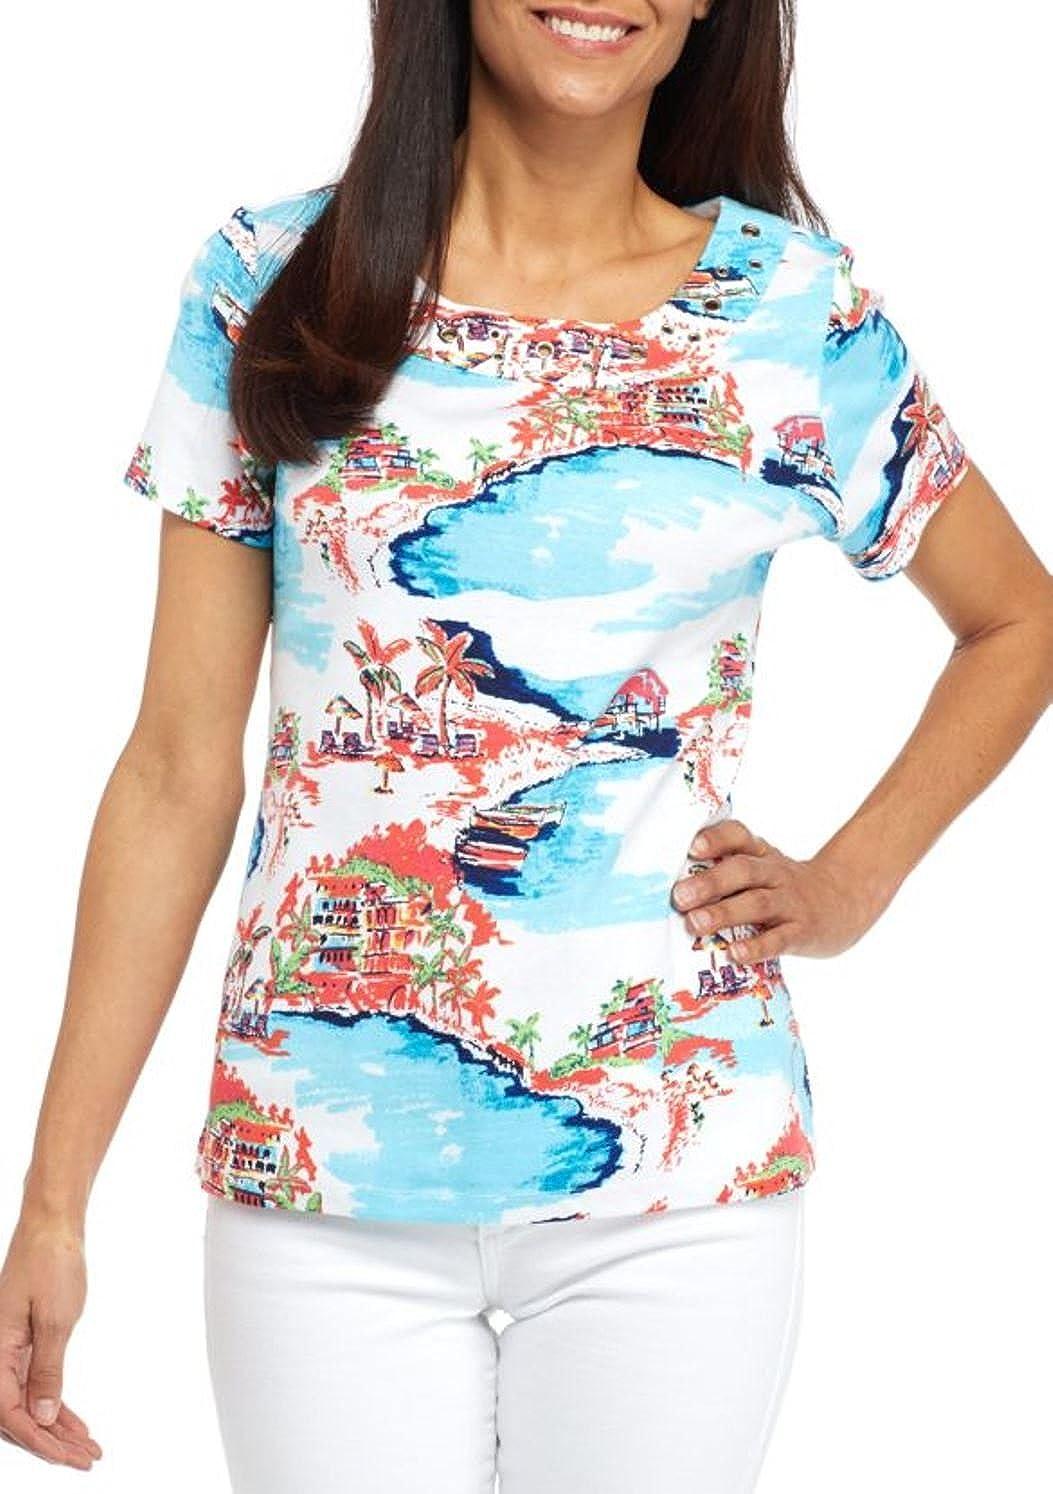 4945bfcb52abb3 Amazon.com  Kim Rogers Women s Petite Size Short Sleeve Grom Frame Tee  (Turquoise-Coral